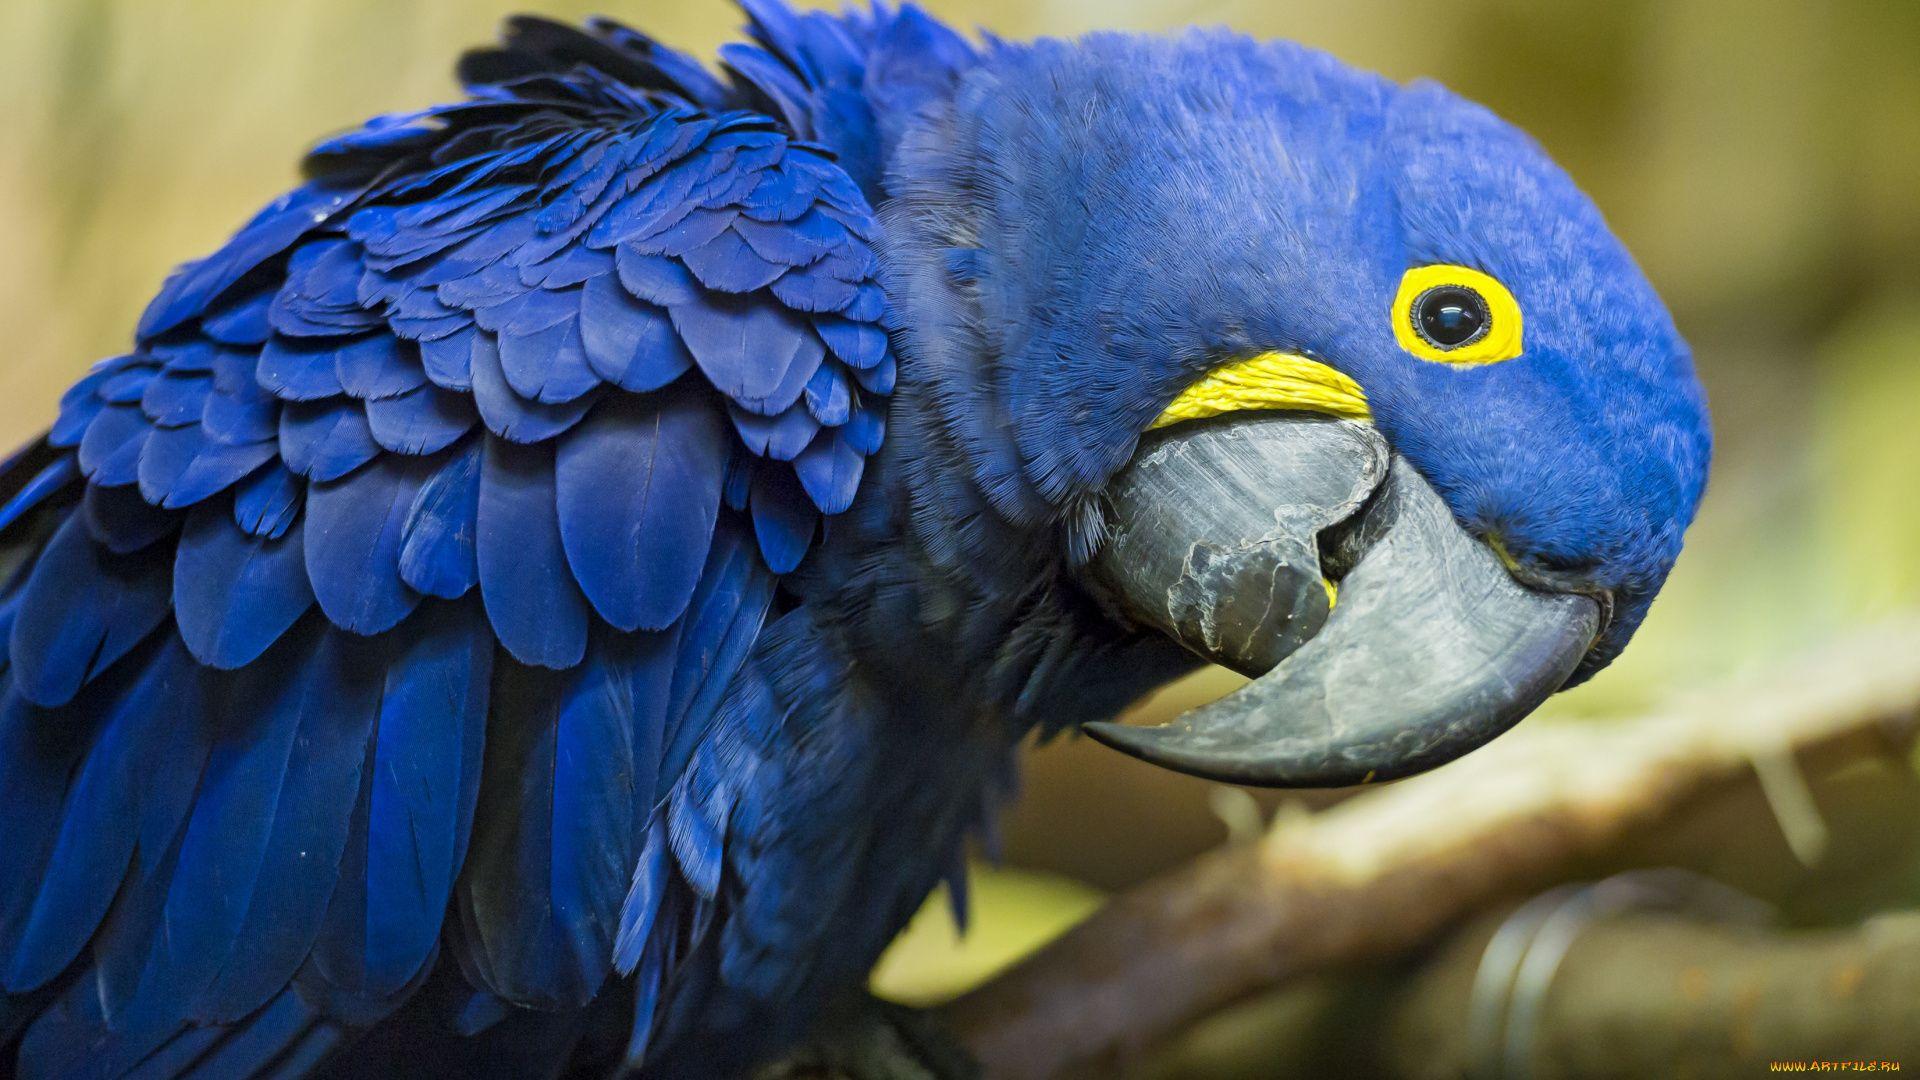 Blue Macaw Parrot Photos